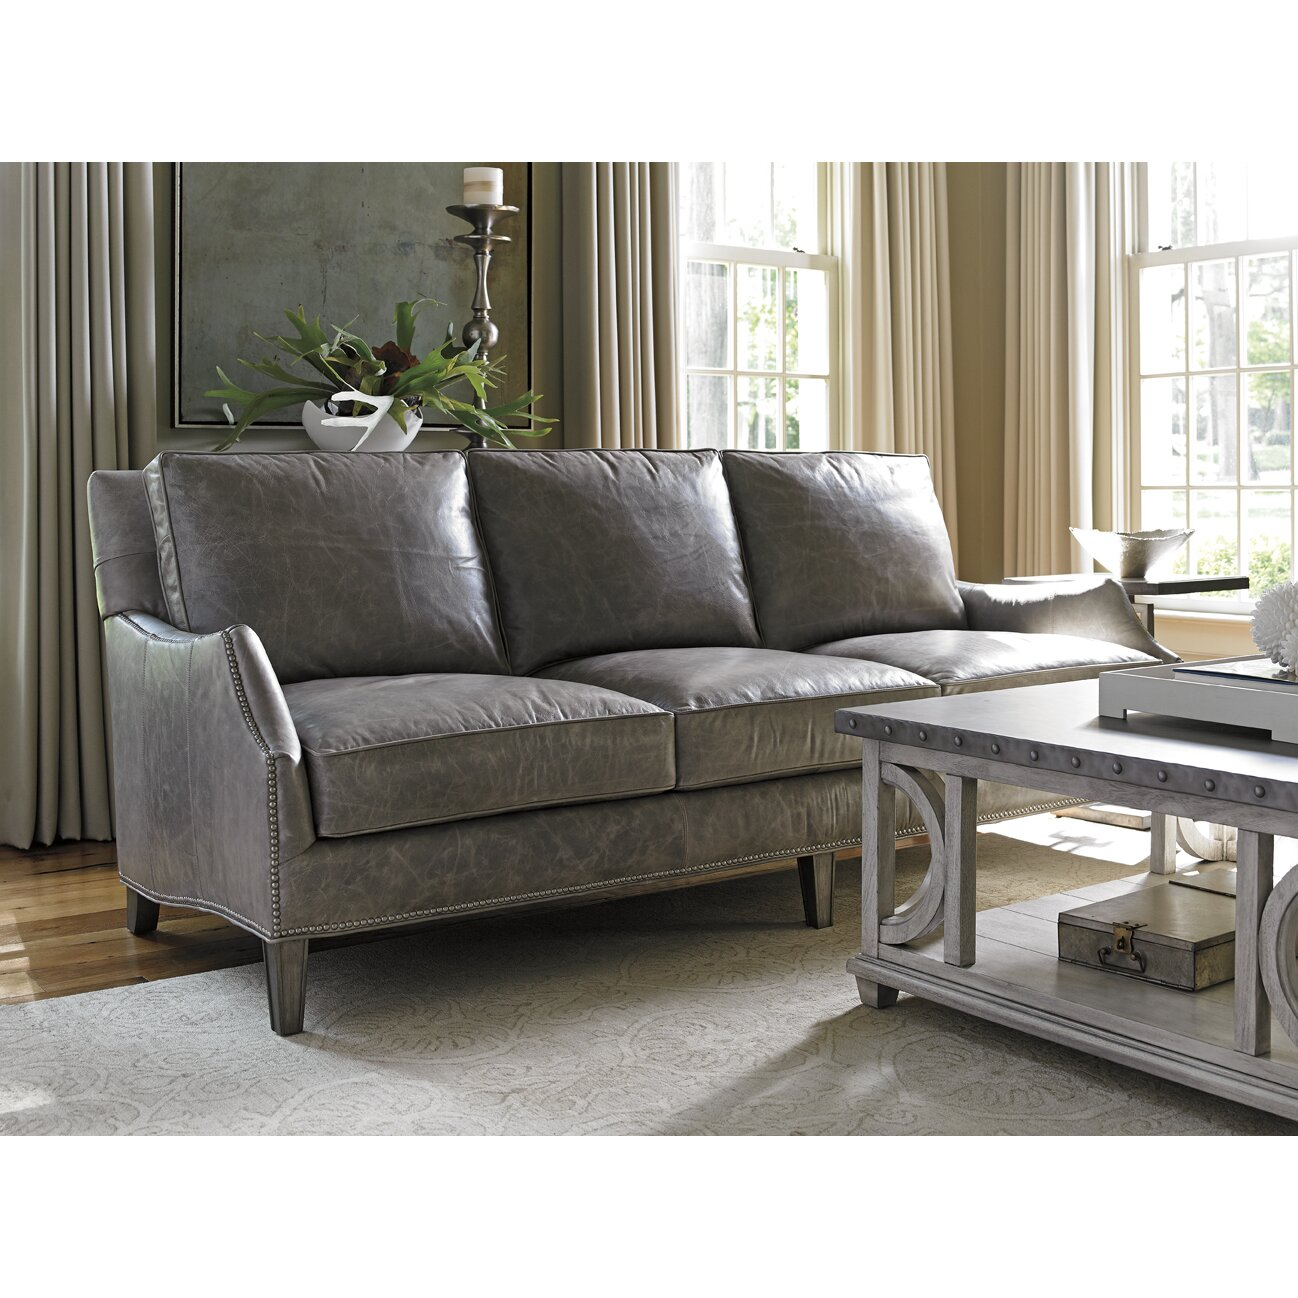 Lexington Oyster Bay Ashton Leather Sofa Amp Reviews Wayfair